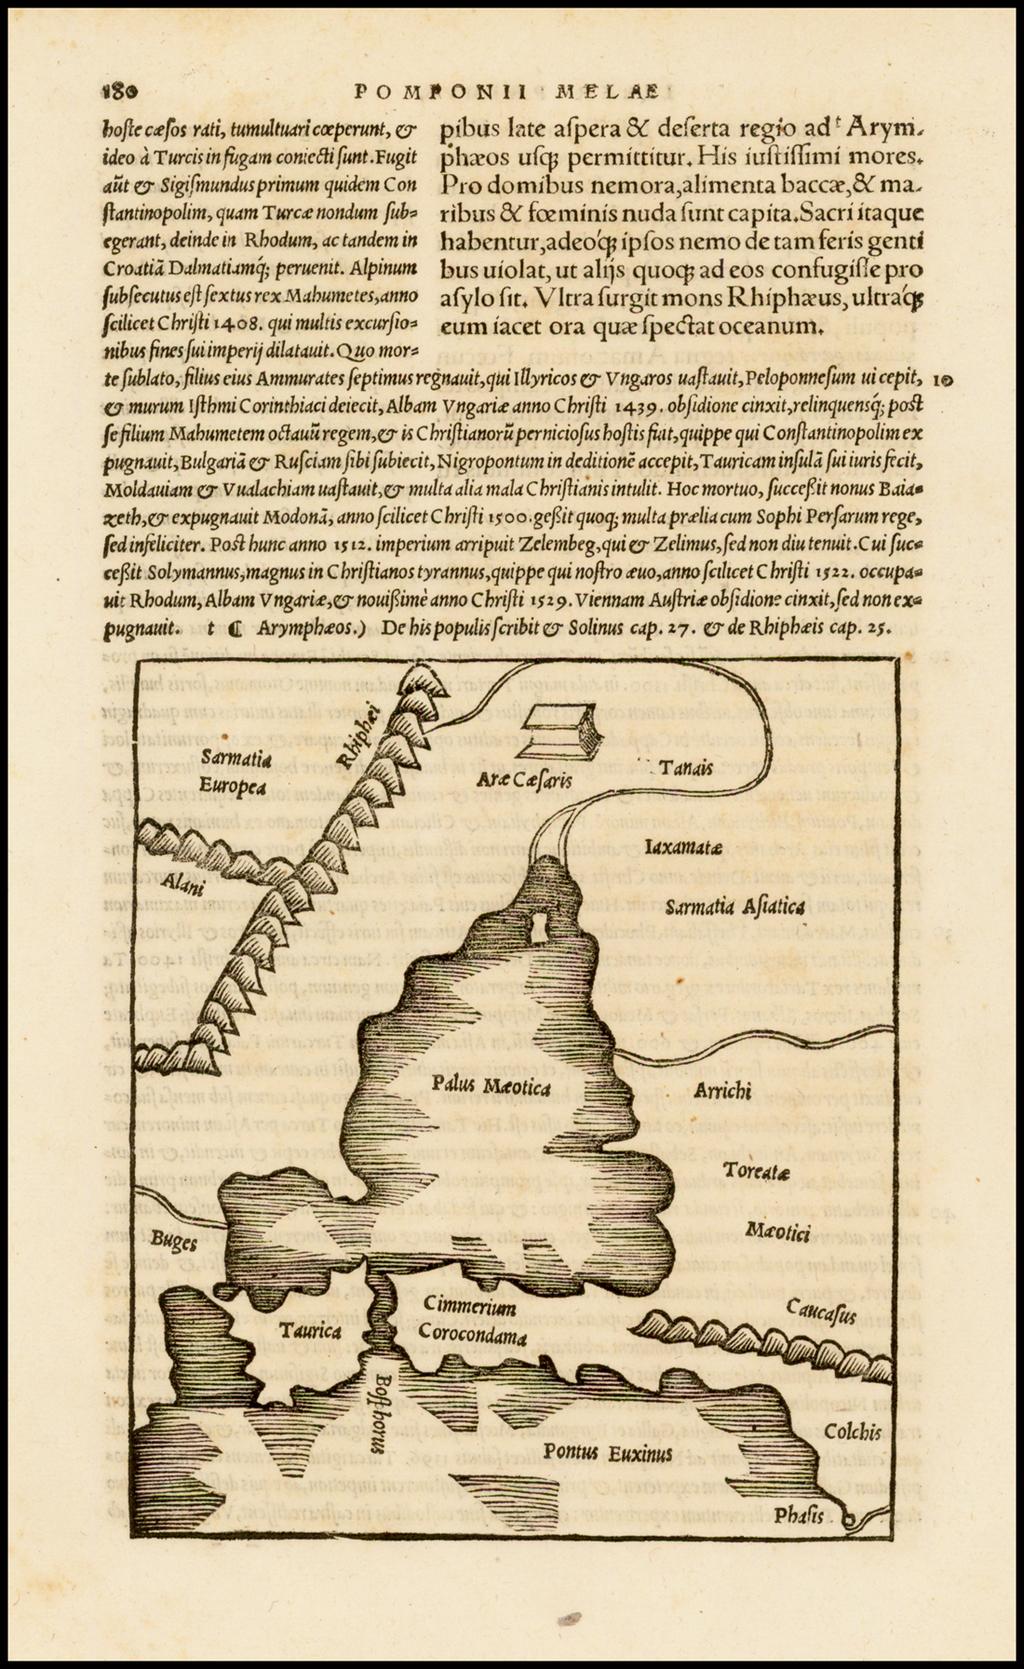 [Bosphorus Straits, Black Sea, Sea of Marmora] By Caius Julius Solinus